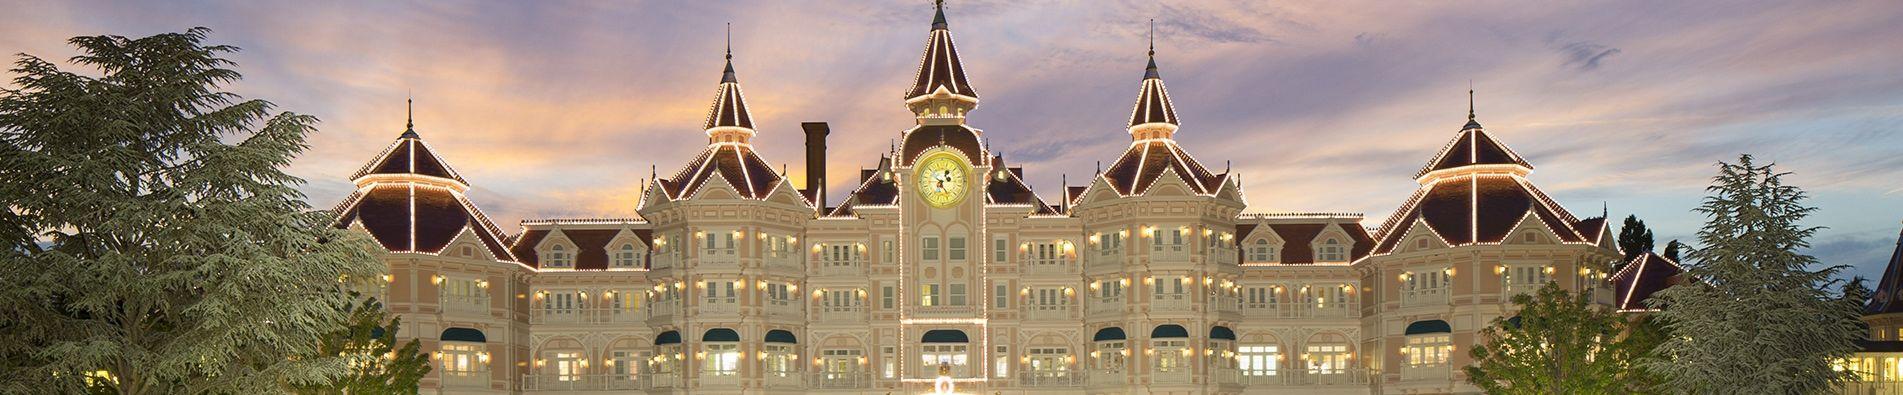 Disneyland Hôtel